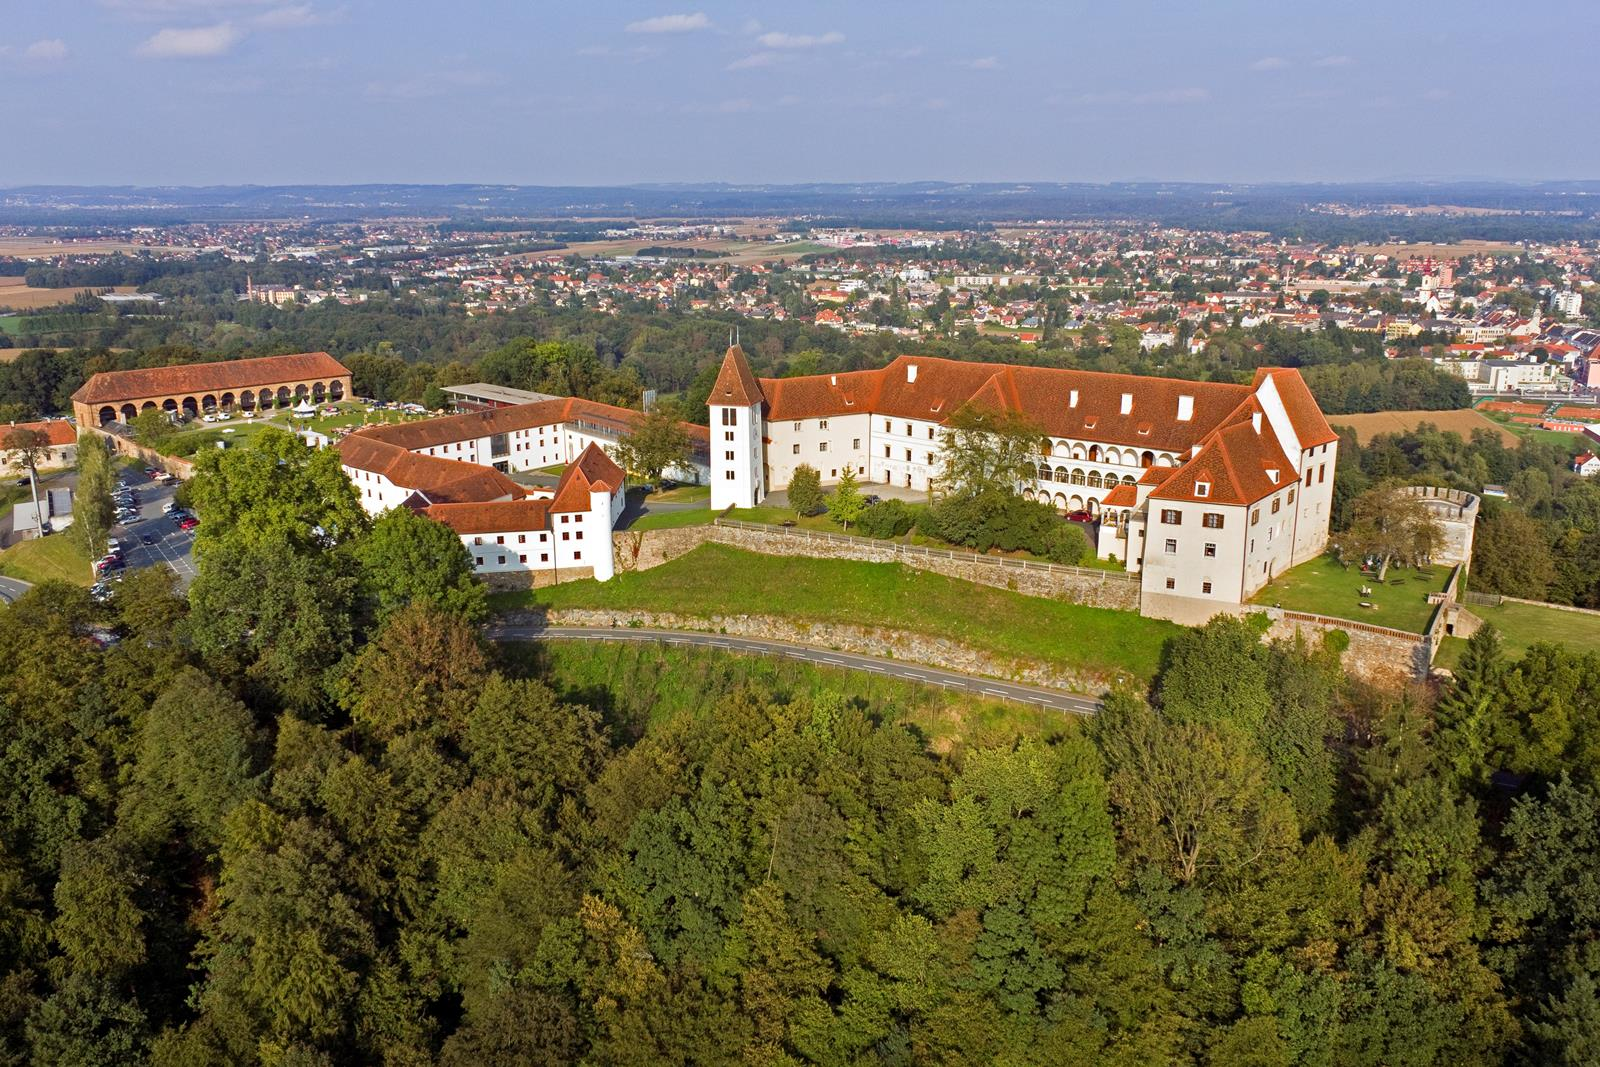 Flugaufnahme XXII Copyright Schloss Seggau